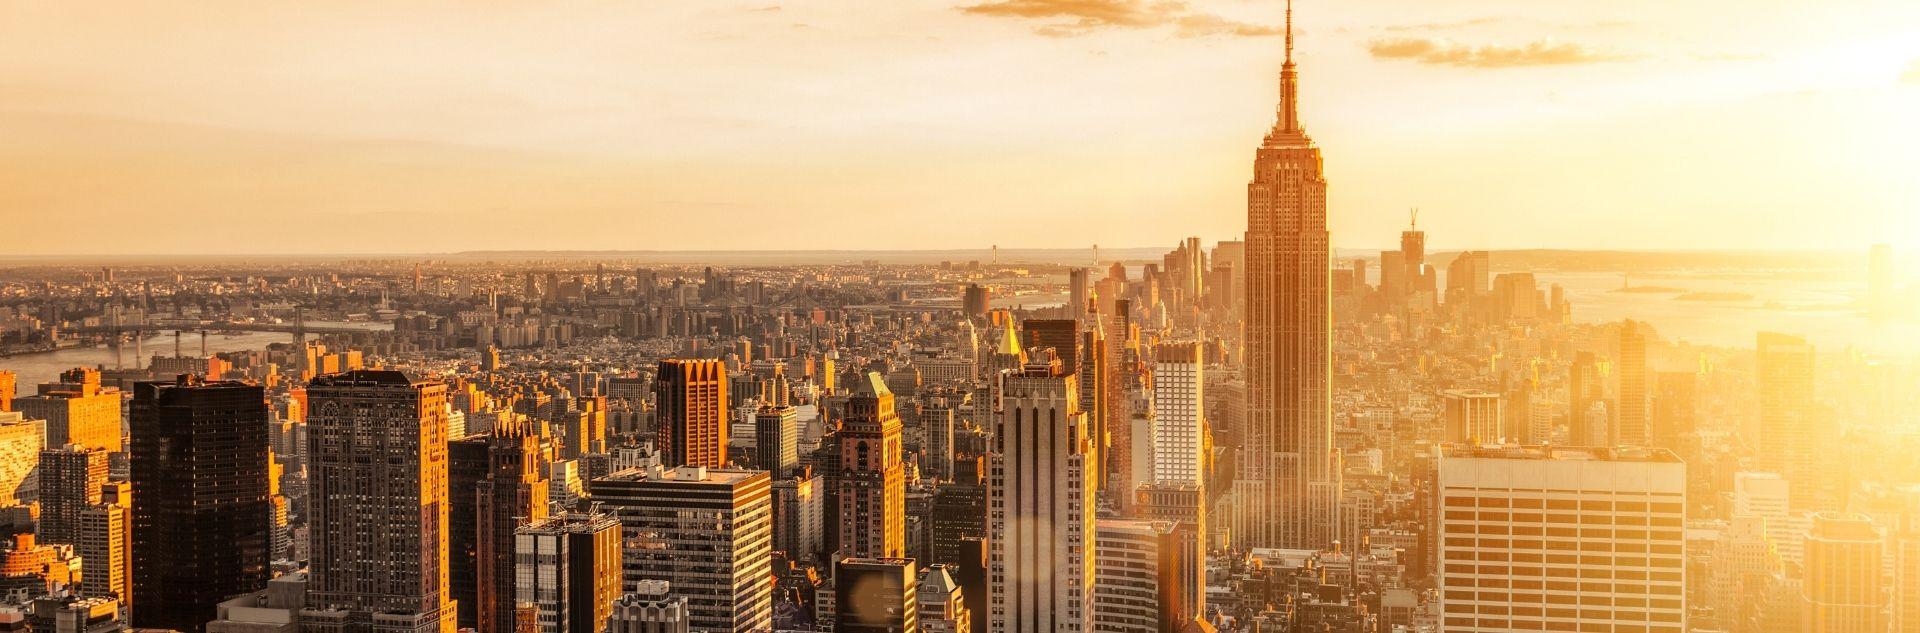 New York Stadt bei Sonnenuntergang